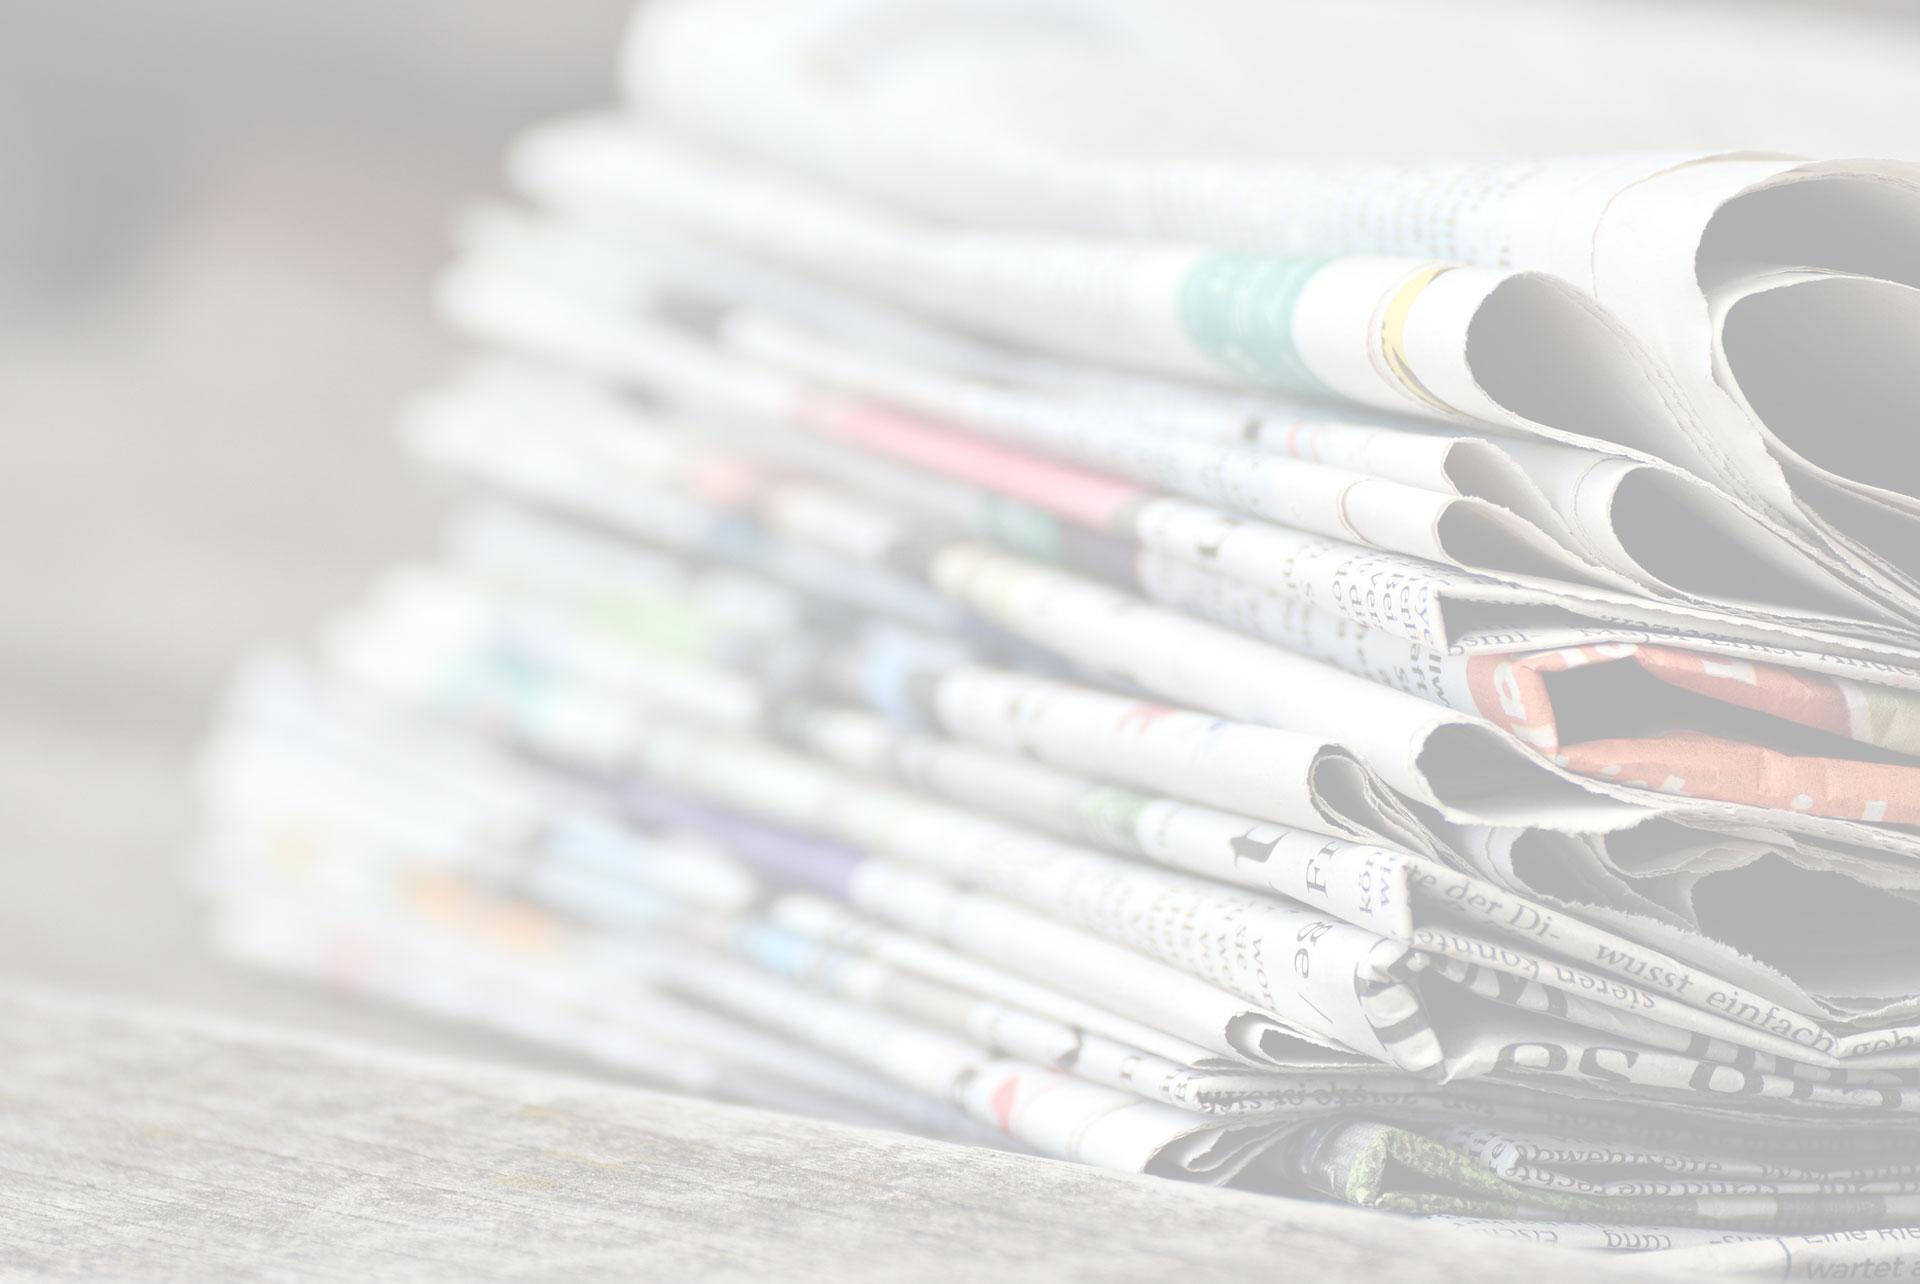 Ristoranti a Torino